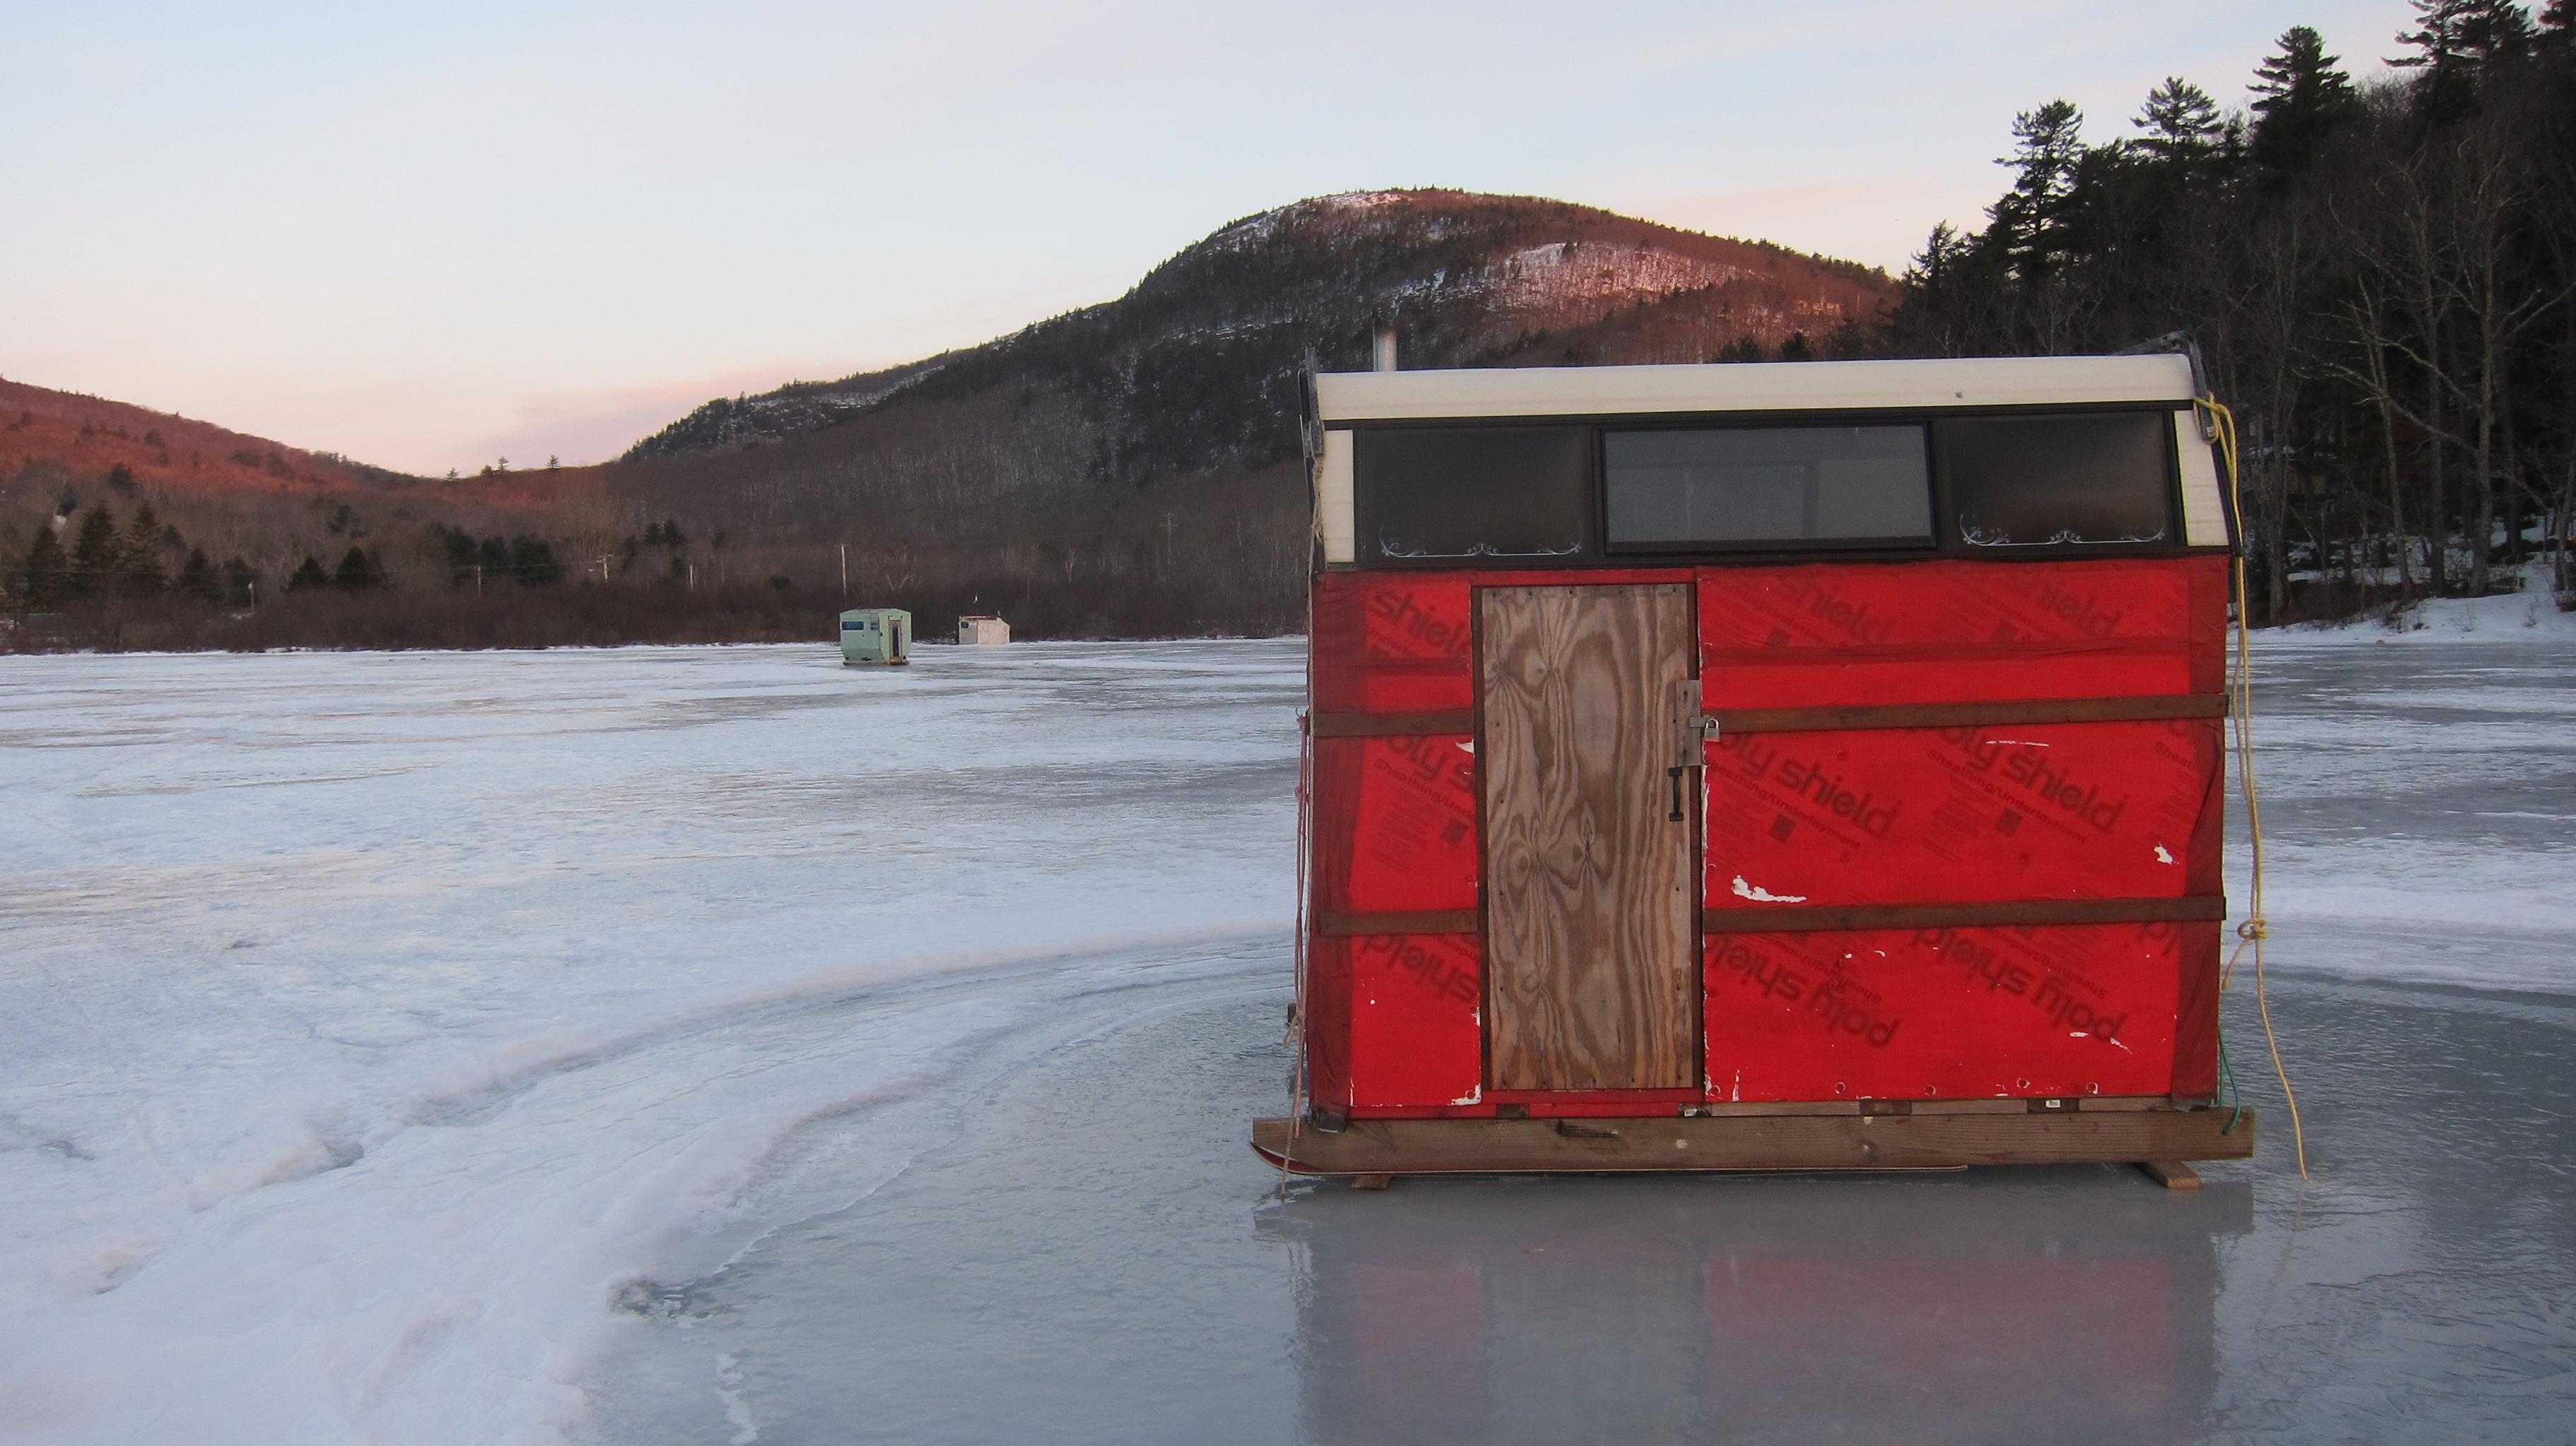 Ice fishing houses - photo#31